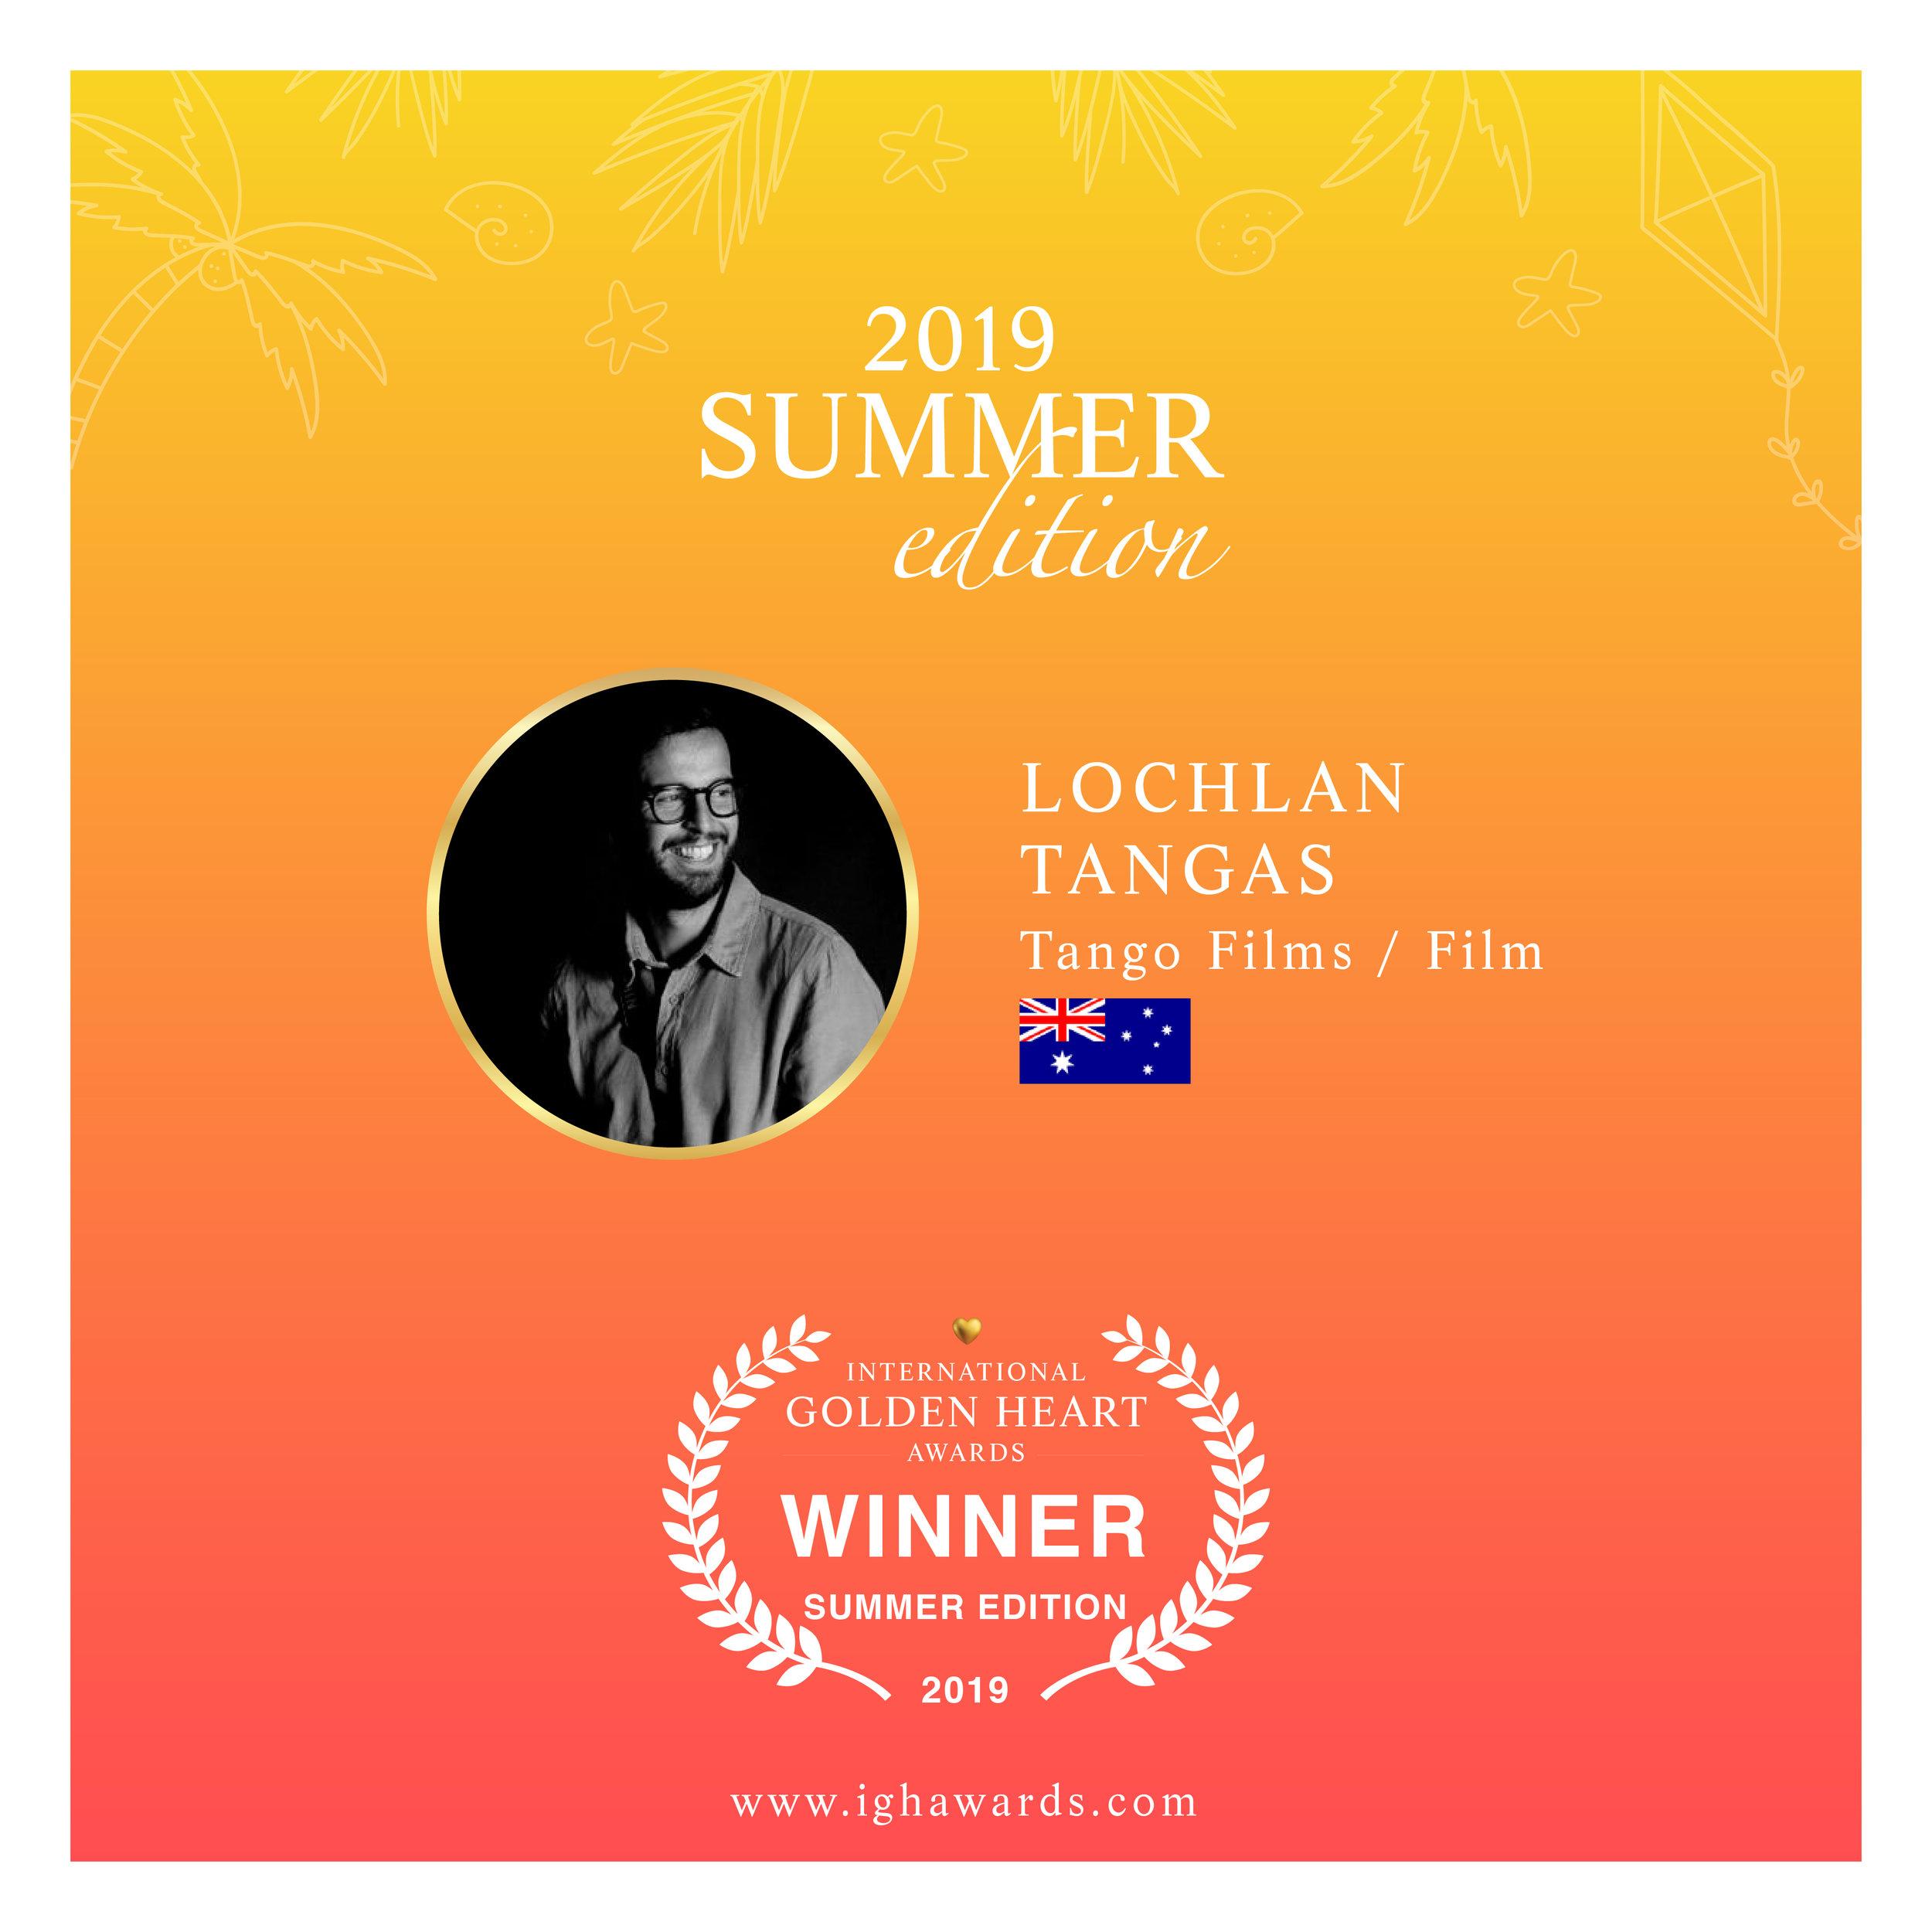 Winner of the 2019 Summer Edition, Golden Heart Award.